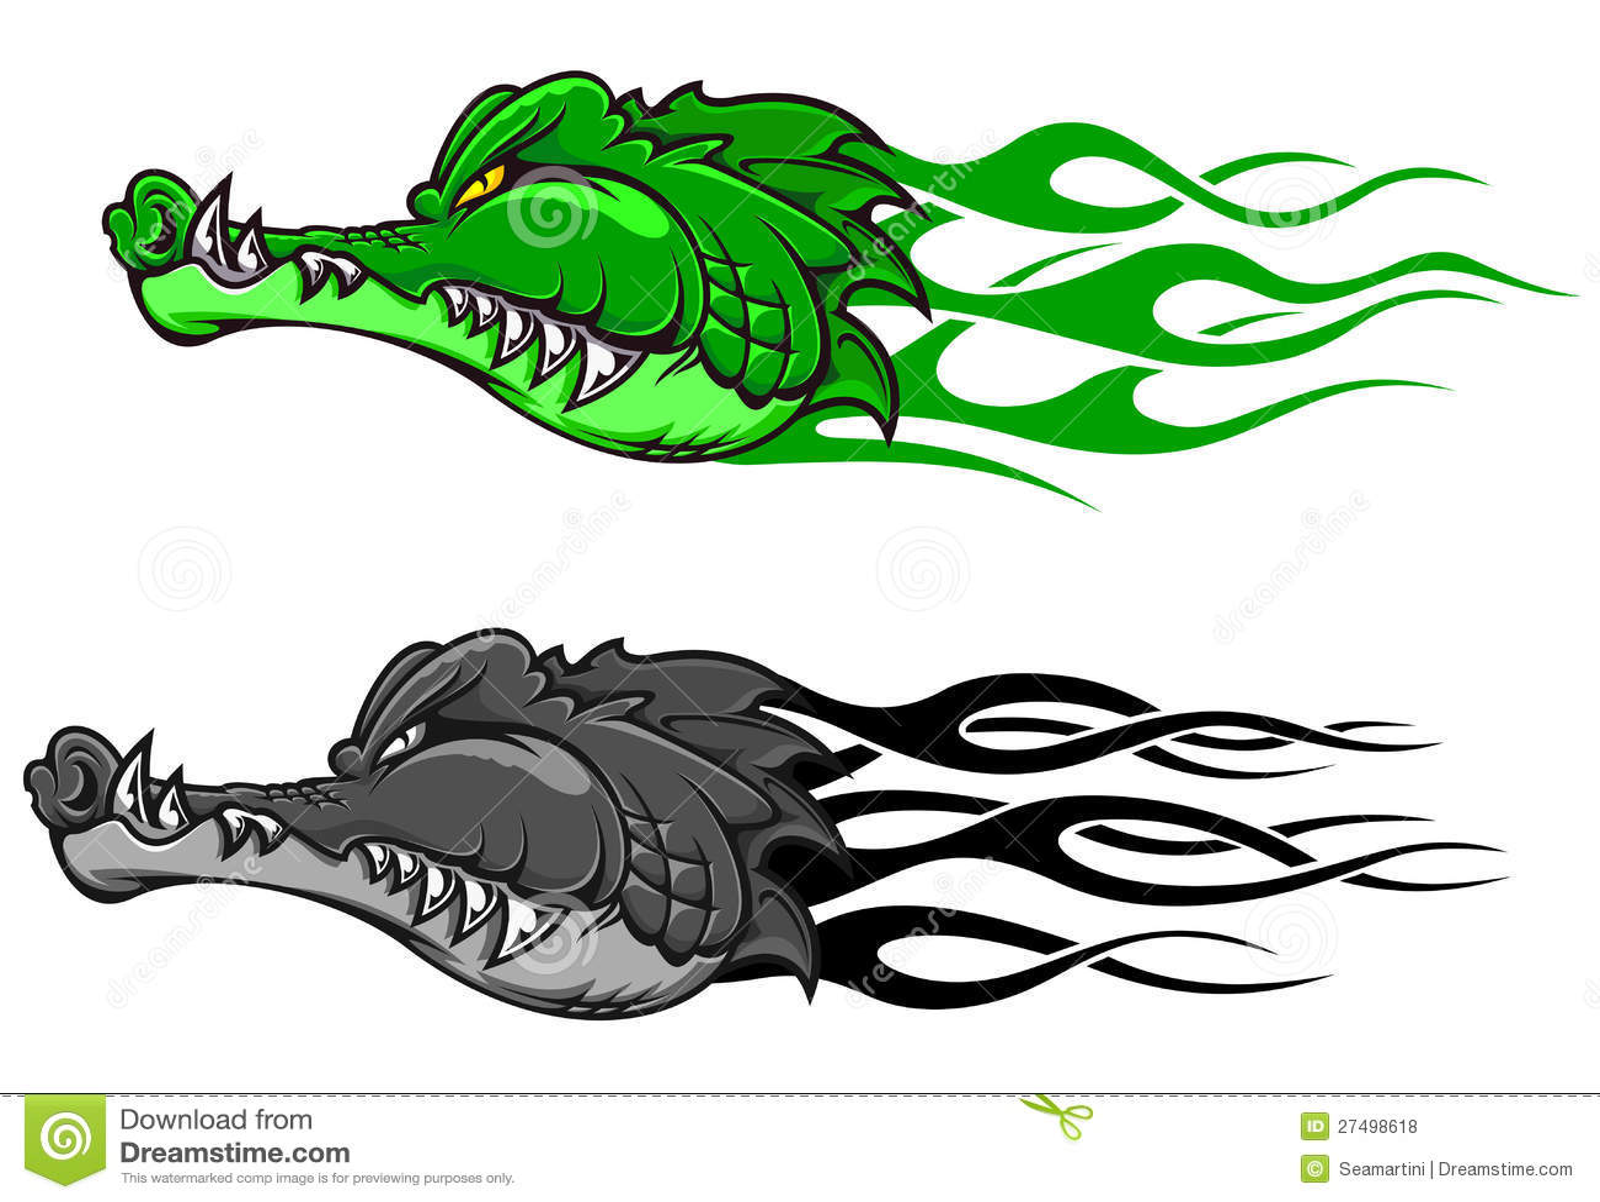 Danger crocodile tattoo